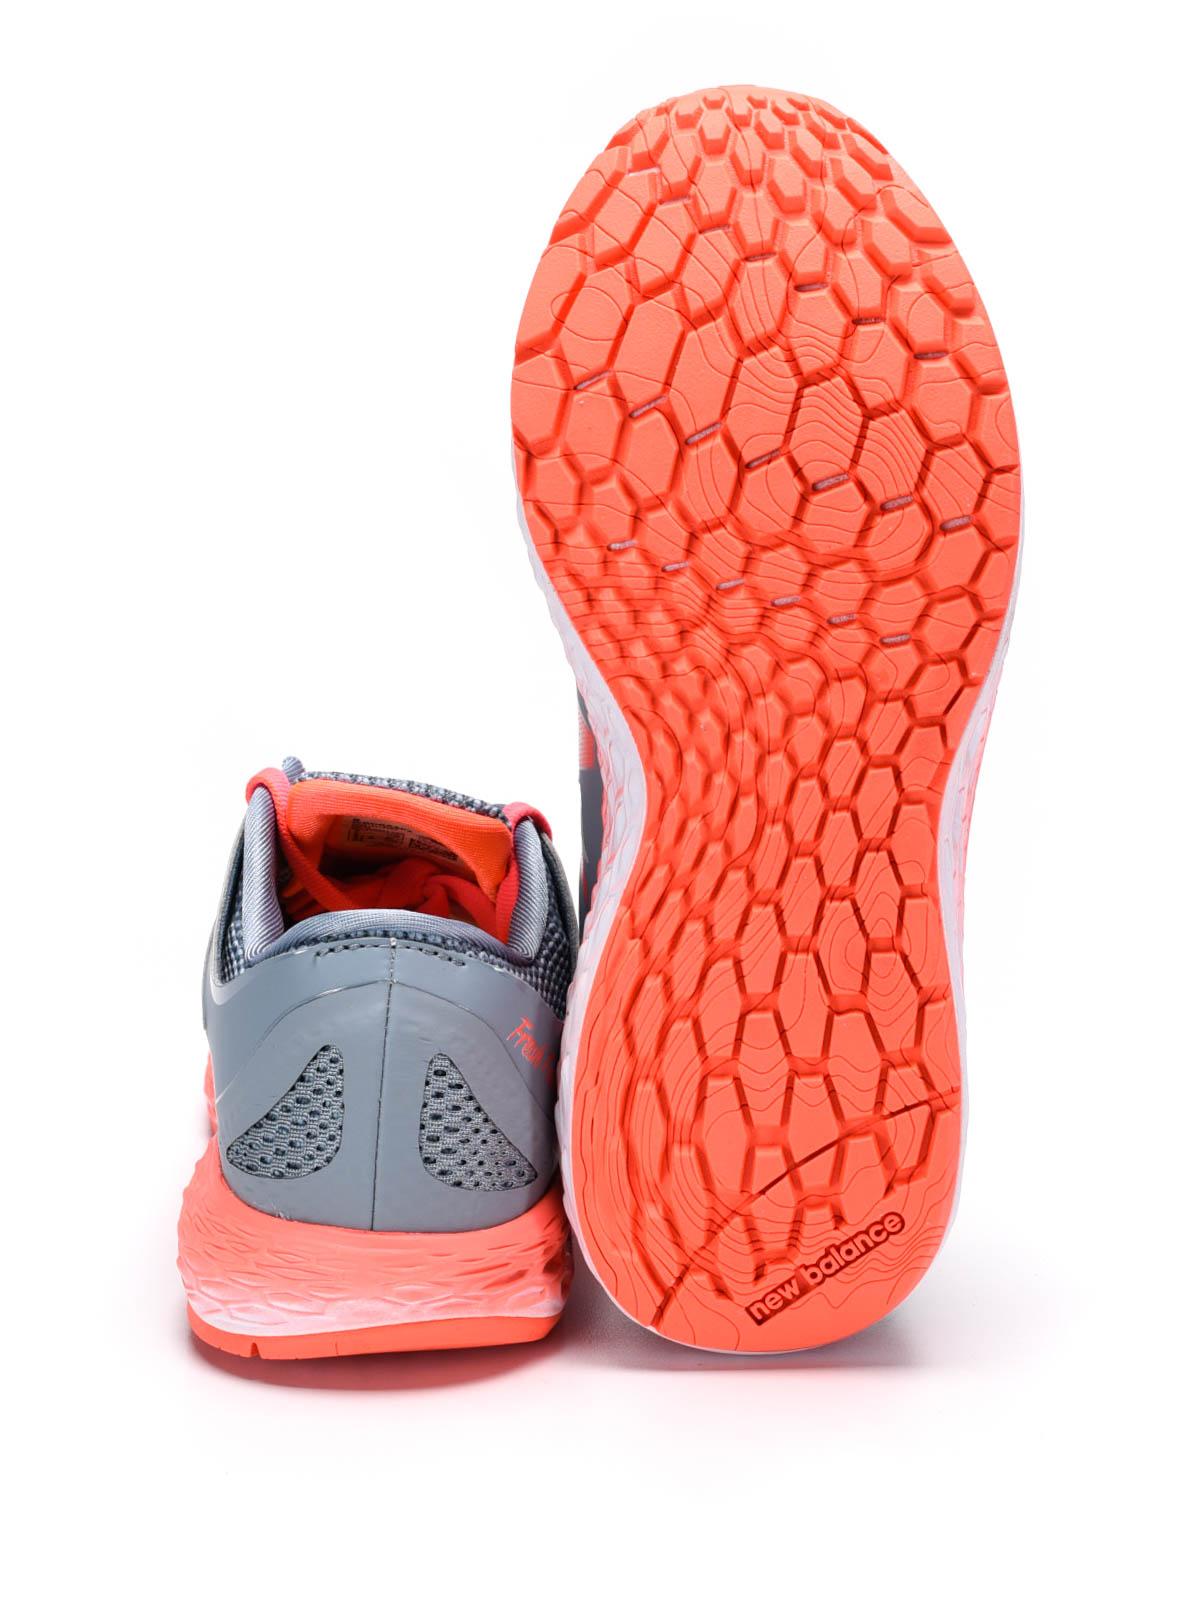 Zapatillas Balance New Wborasp2 Grises Deporte De 5F8wxz8qd